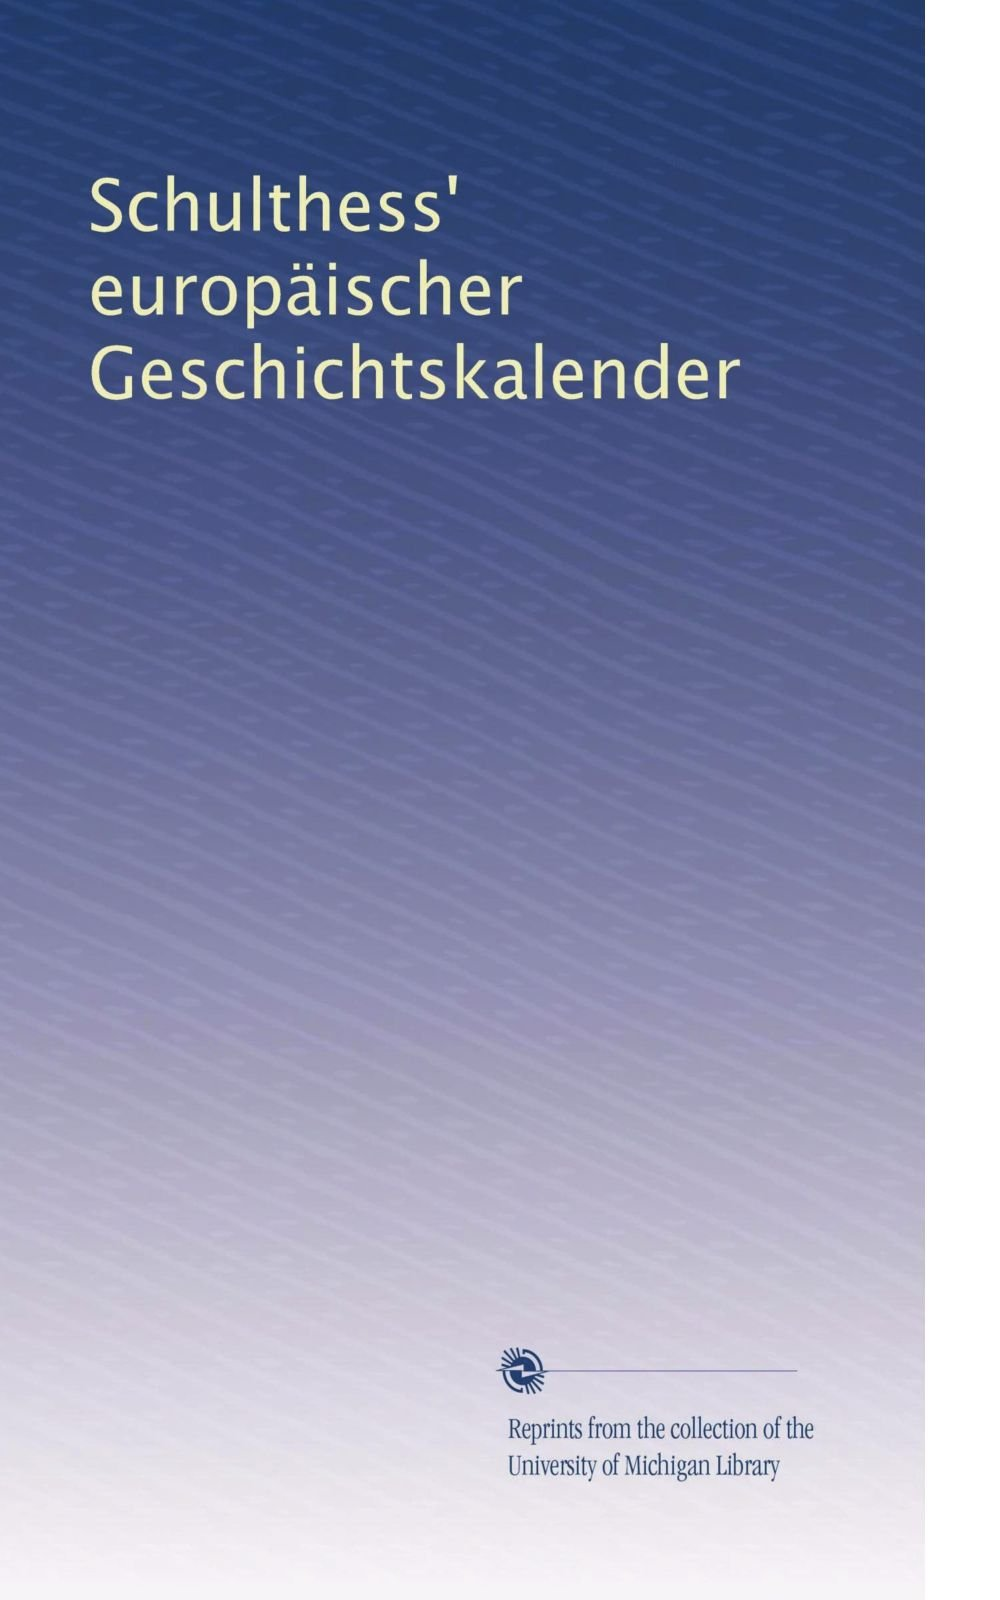 Schulthess' europäischer Geschichtskalender (German Edition) ebook